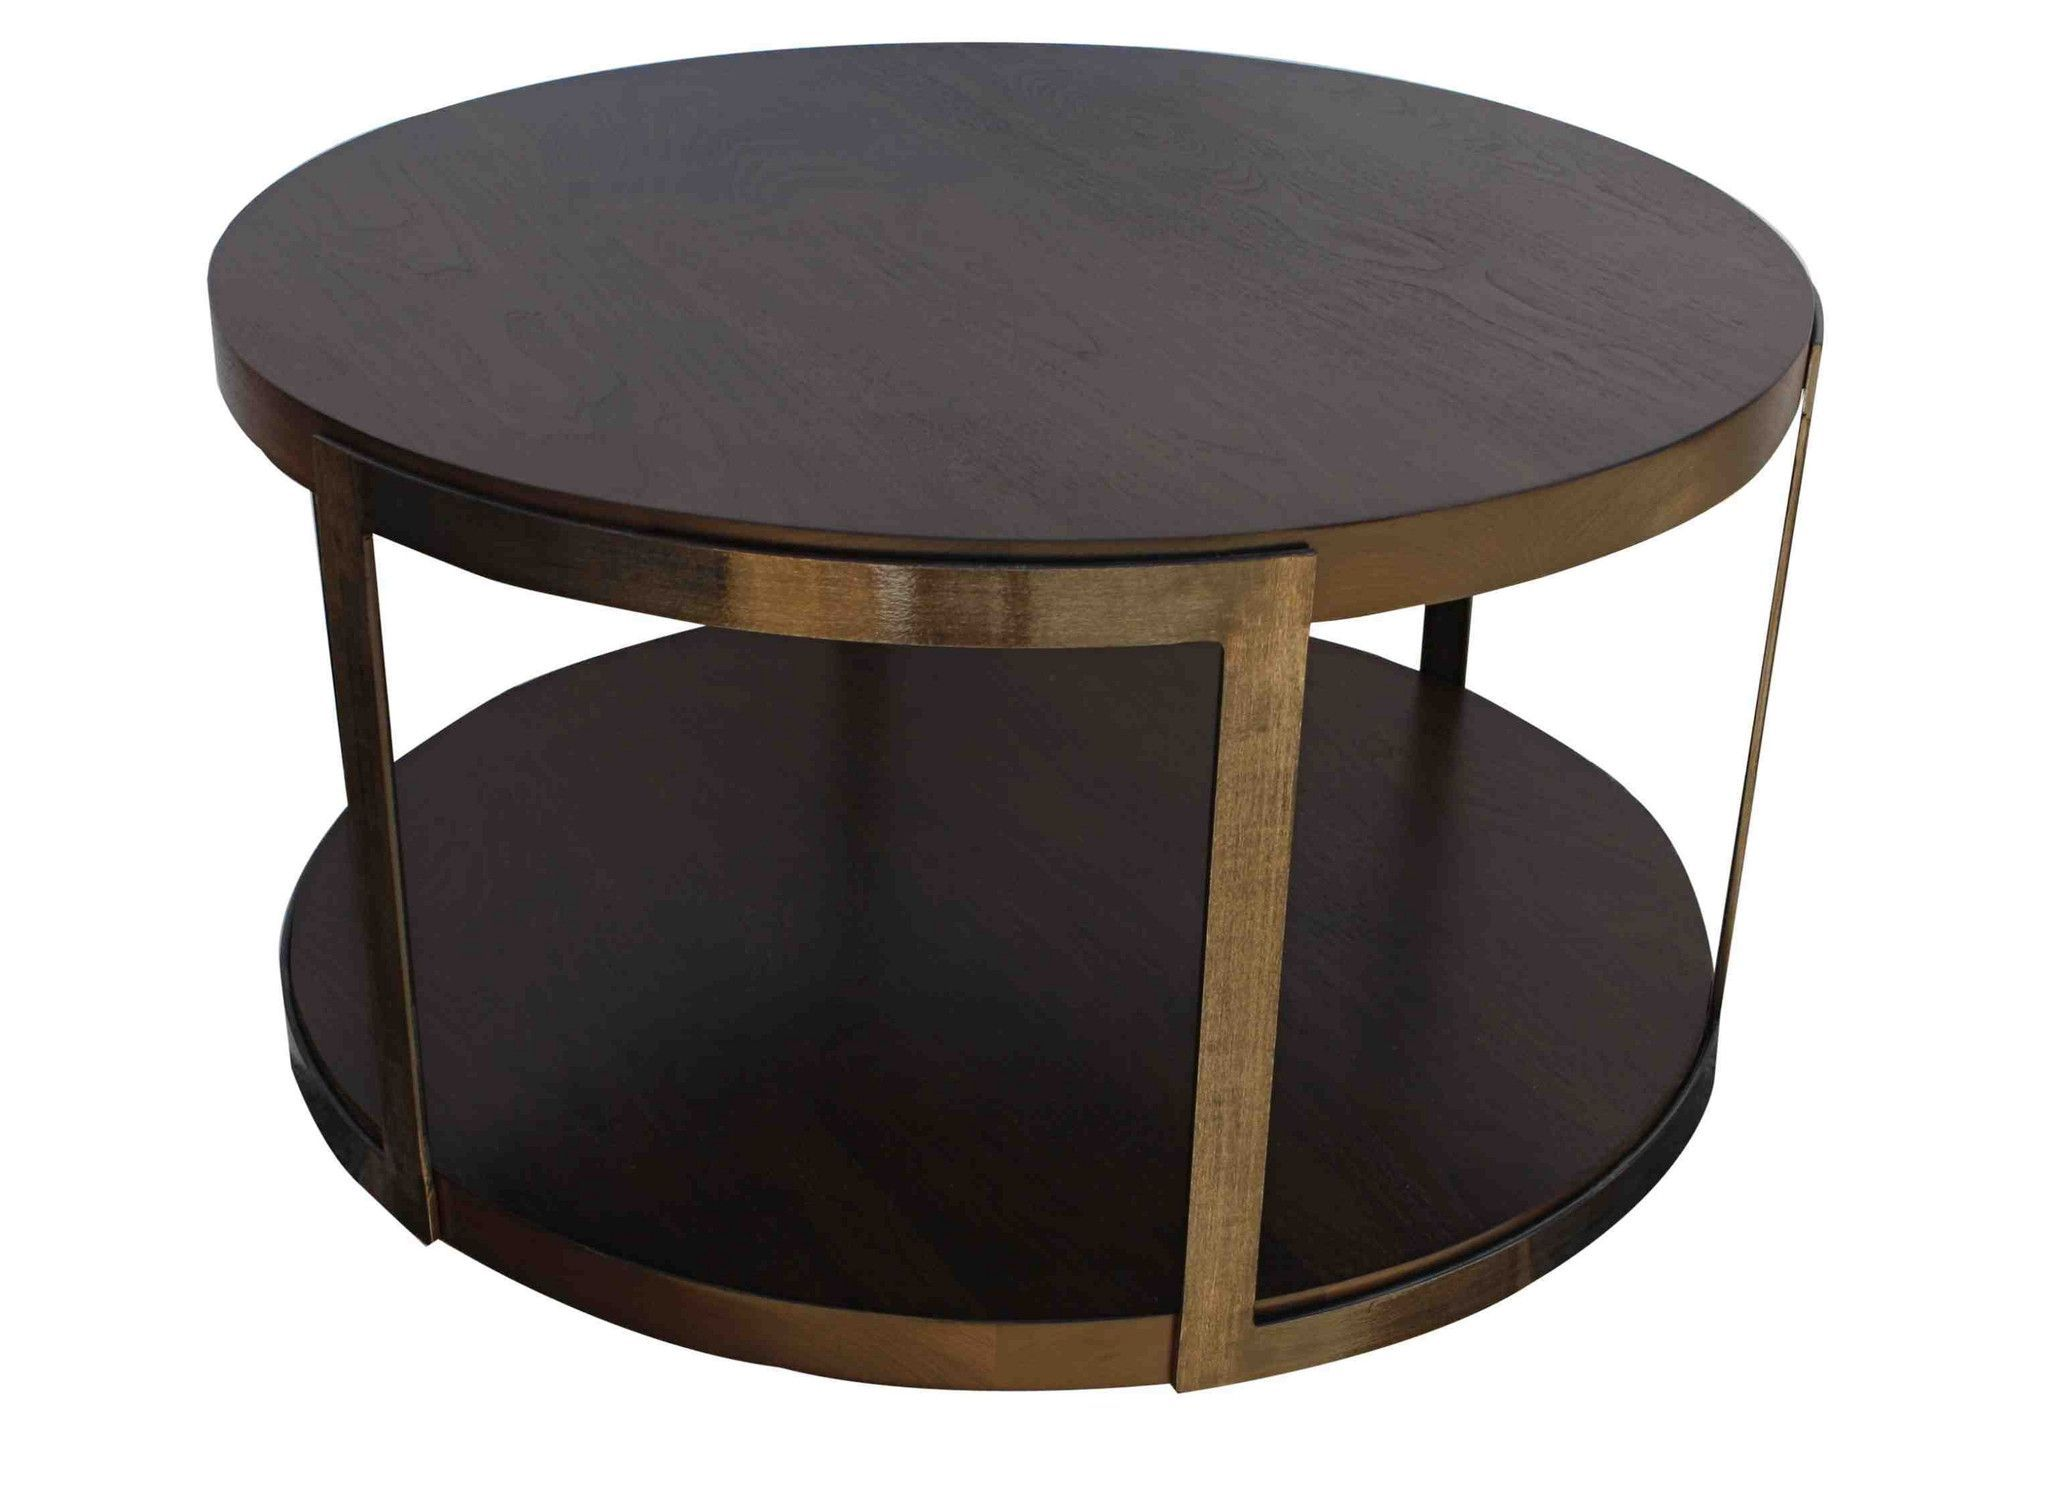 Brooklyn Industrial Modern Coffee table